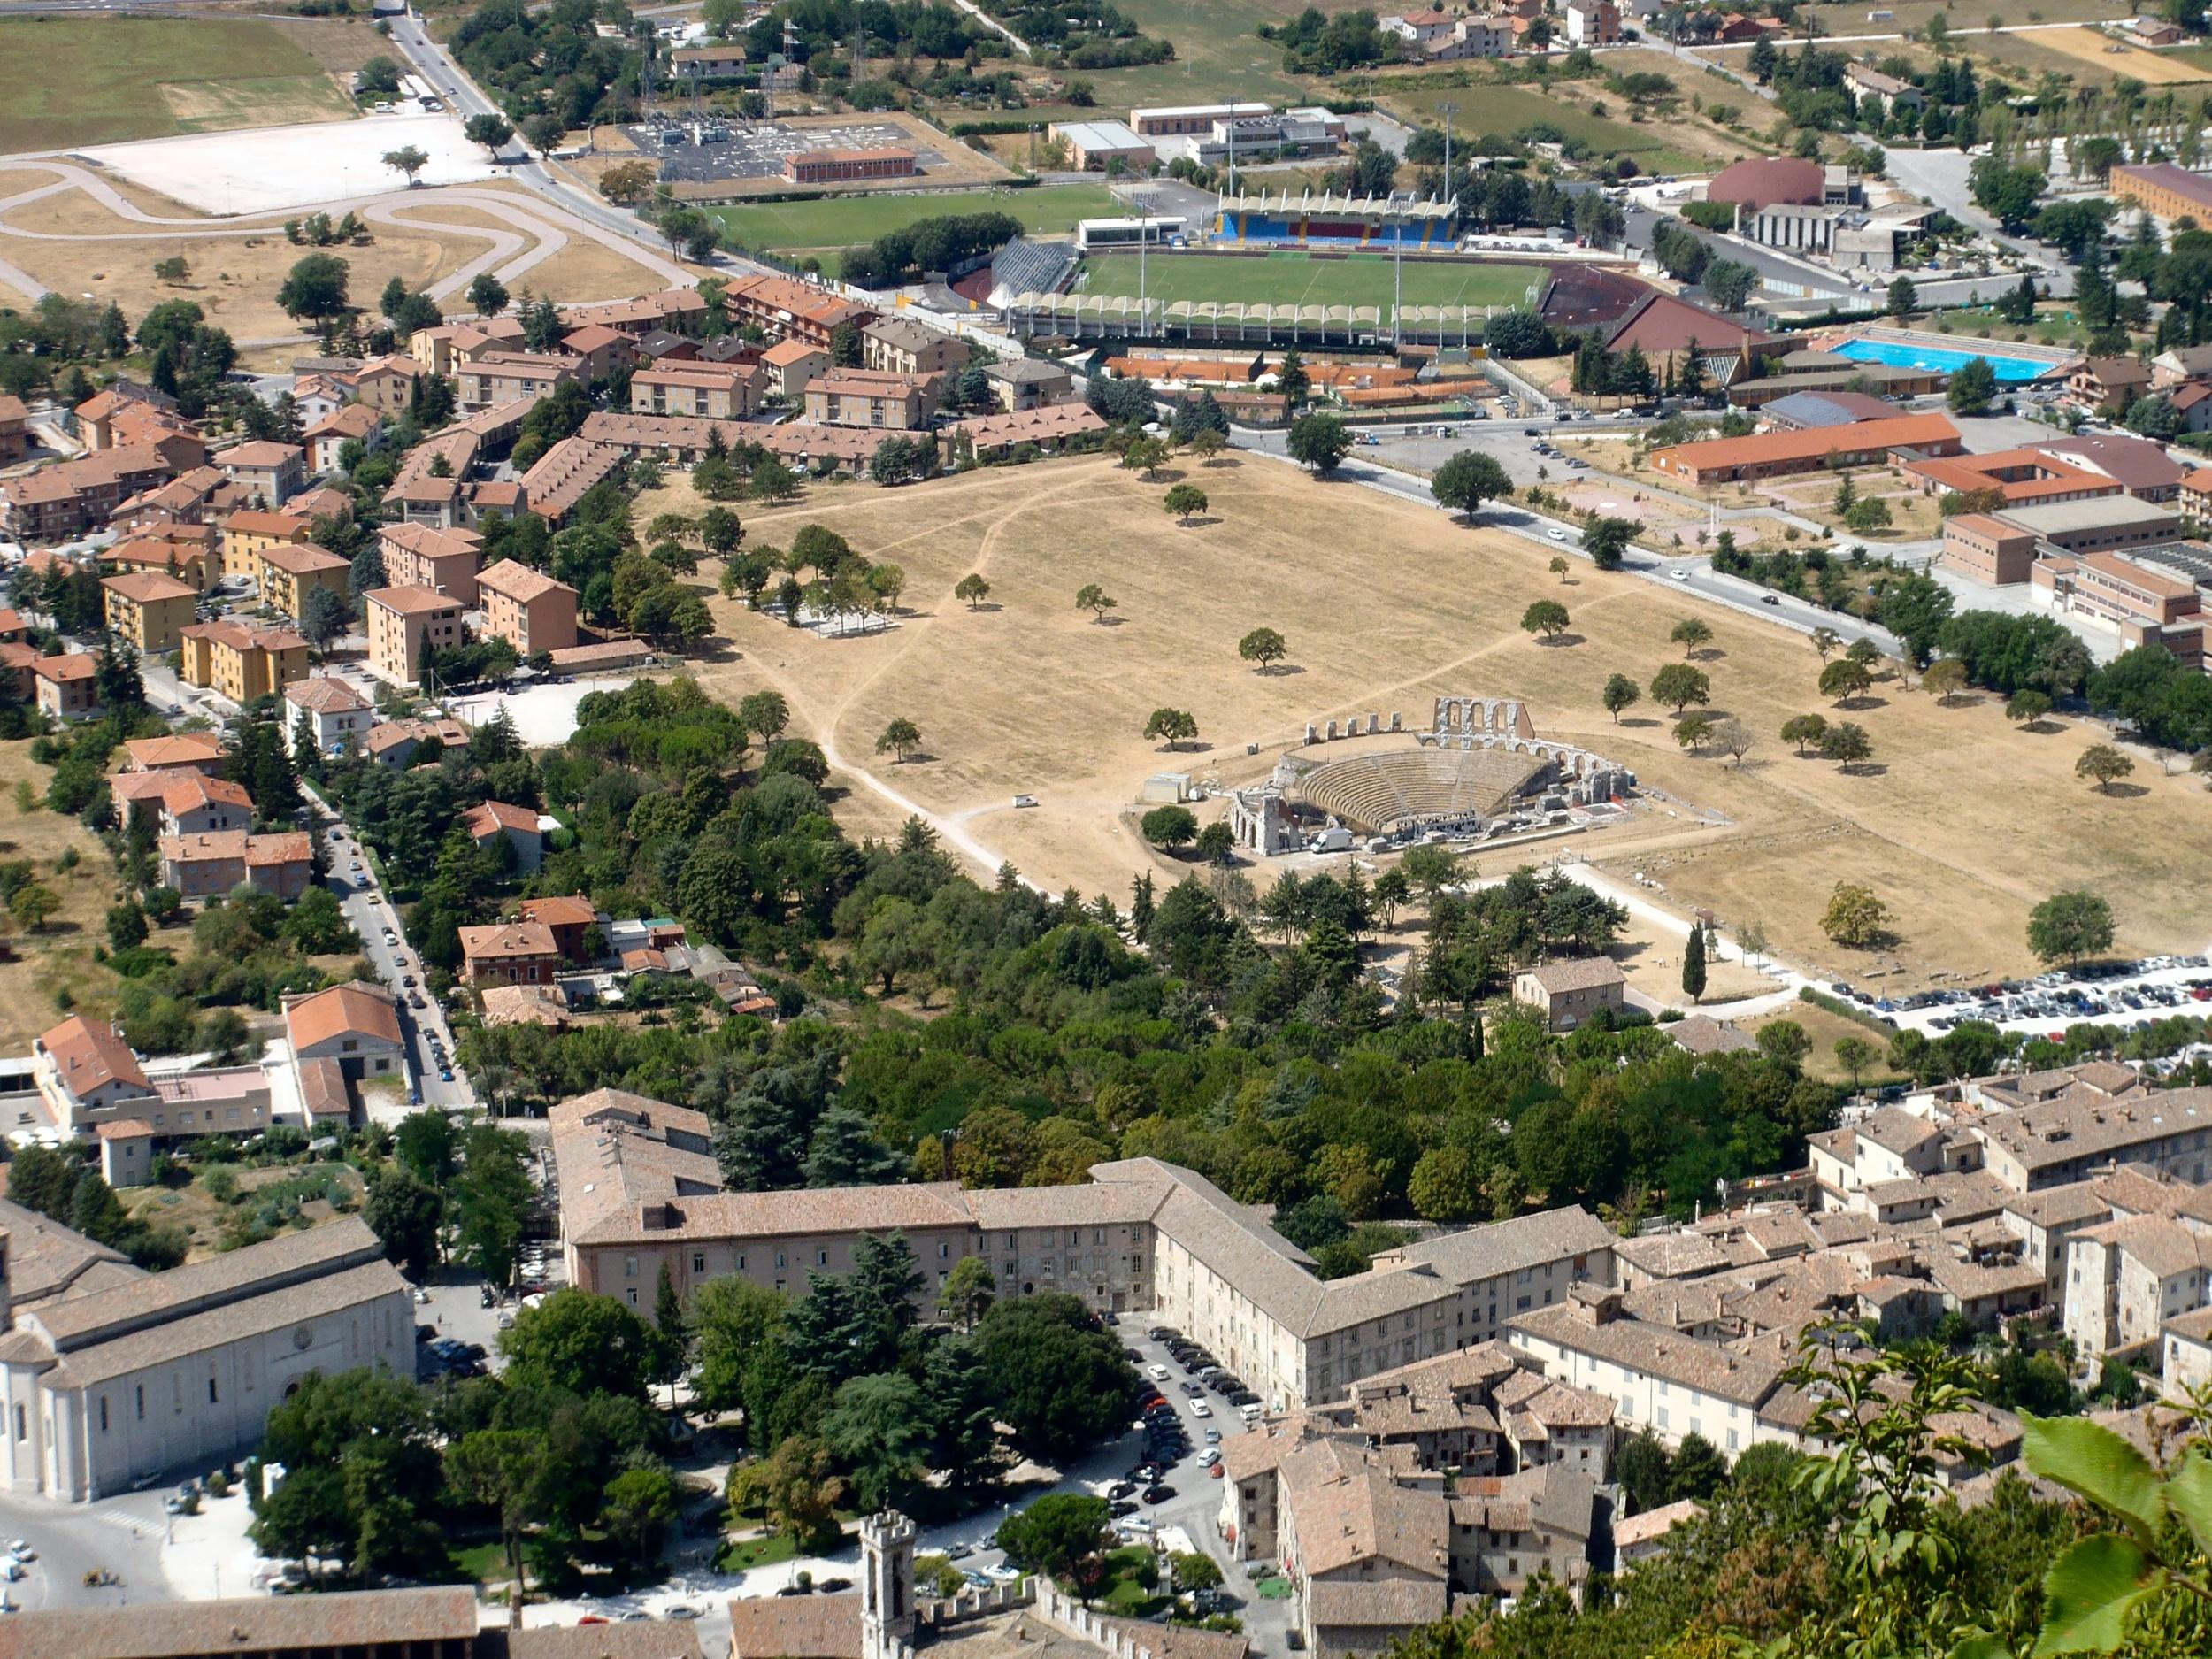 CRO Italy web 2012 - 36.jpg